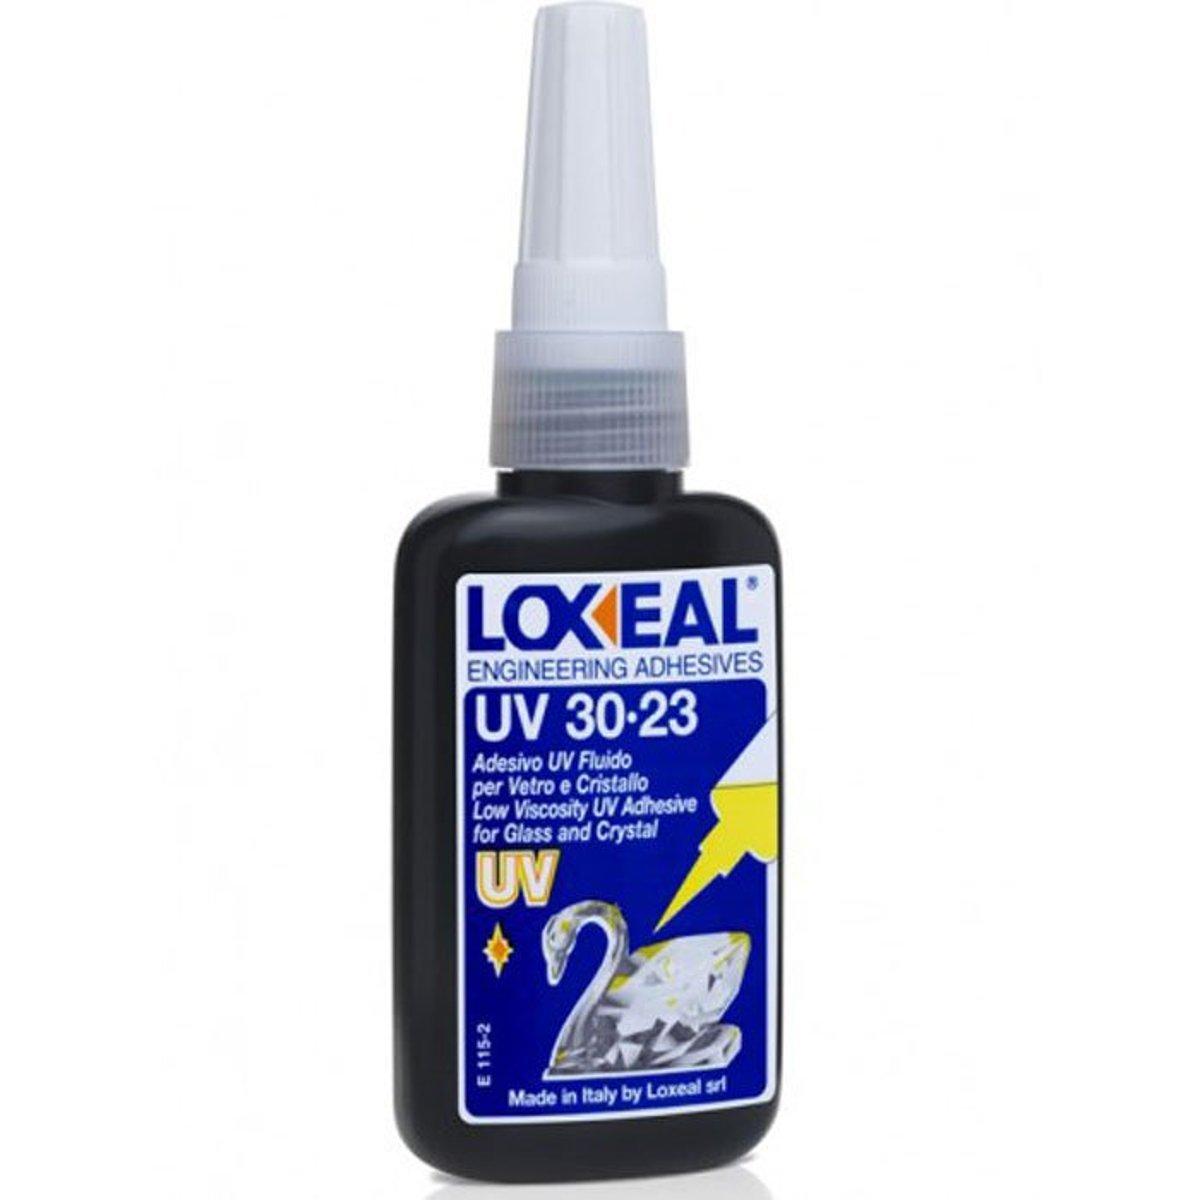 LOXEAL ADESIVO UV 30-23 50ML adesivo indurente vetro e cristallo GLD Forniture